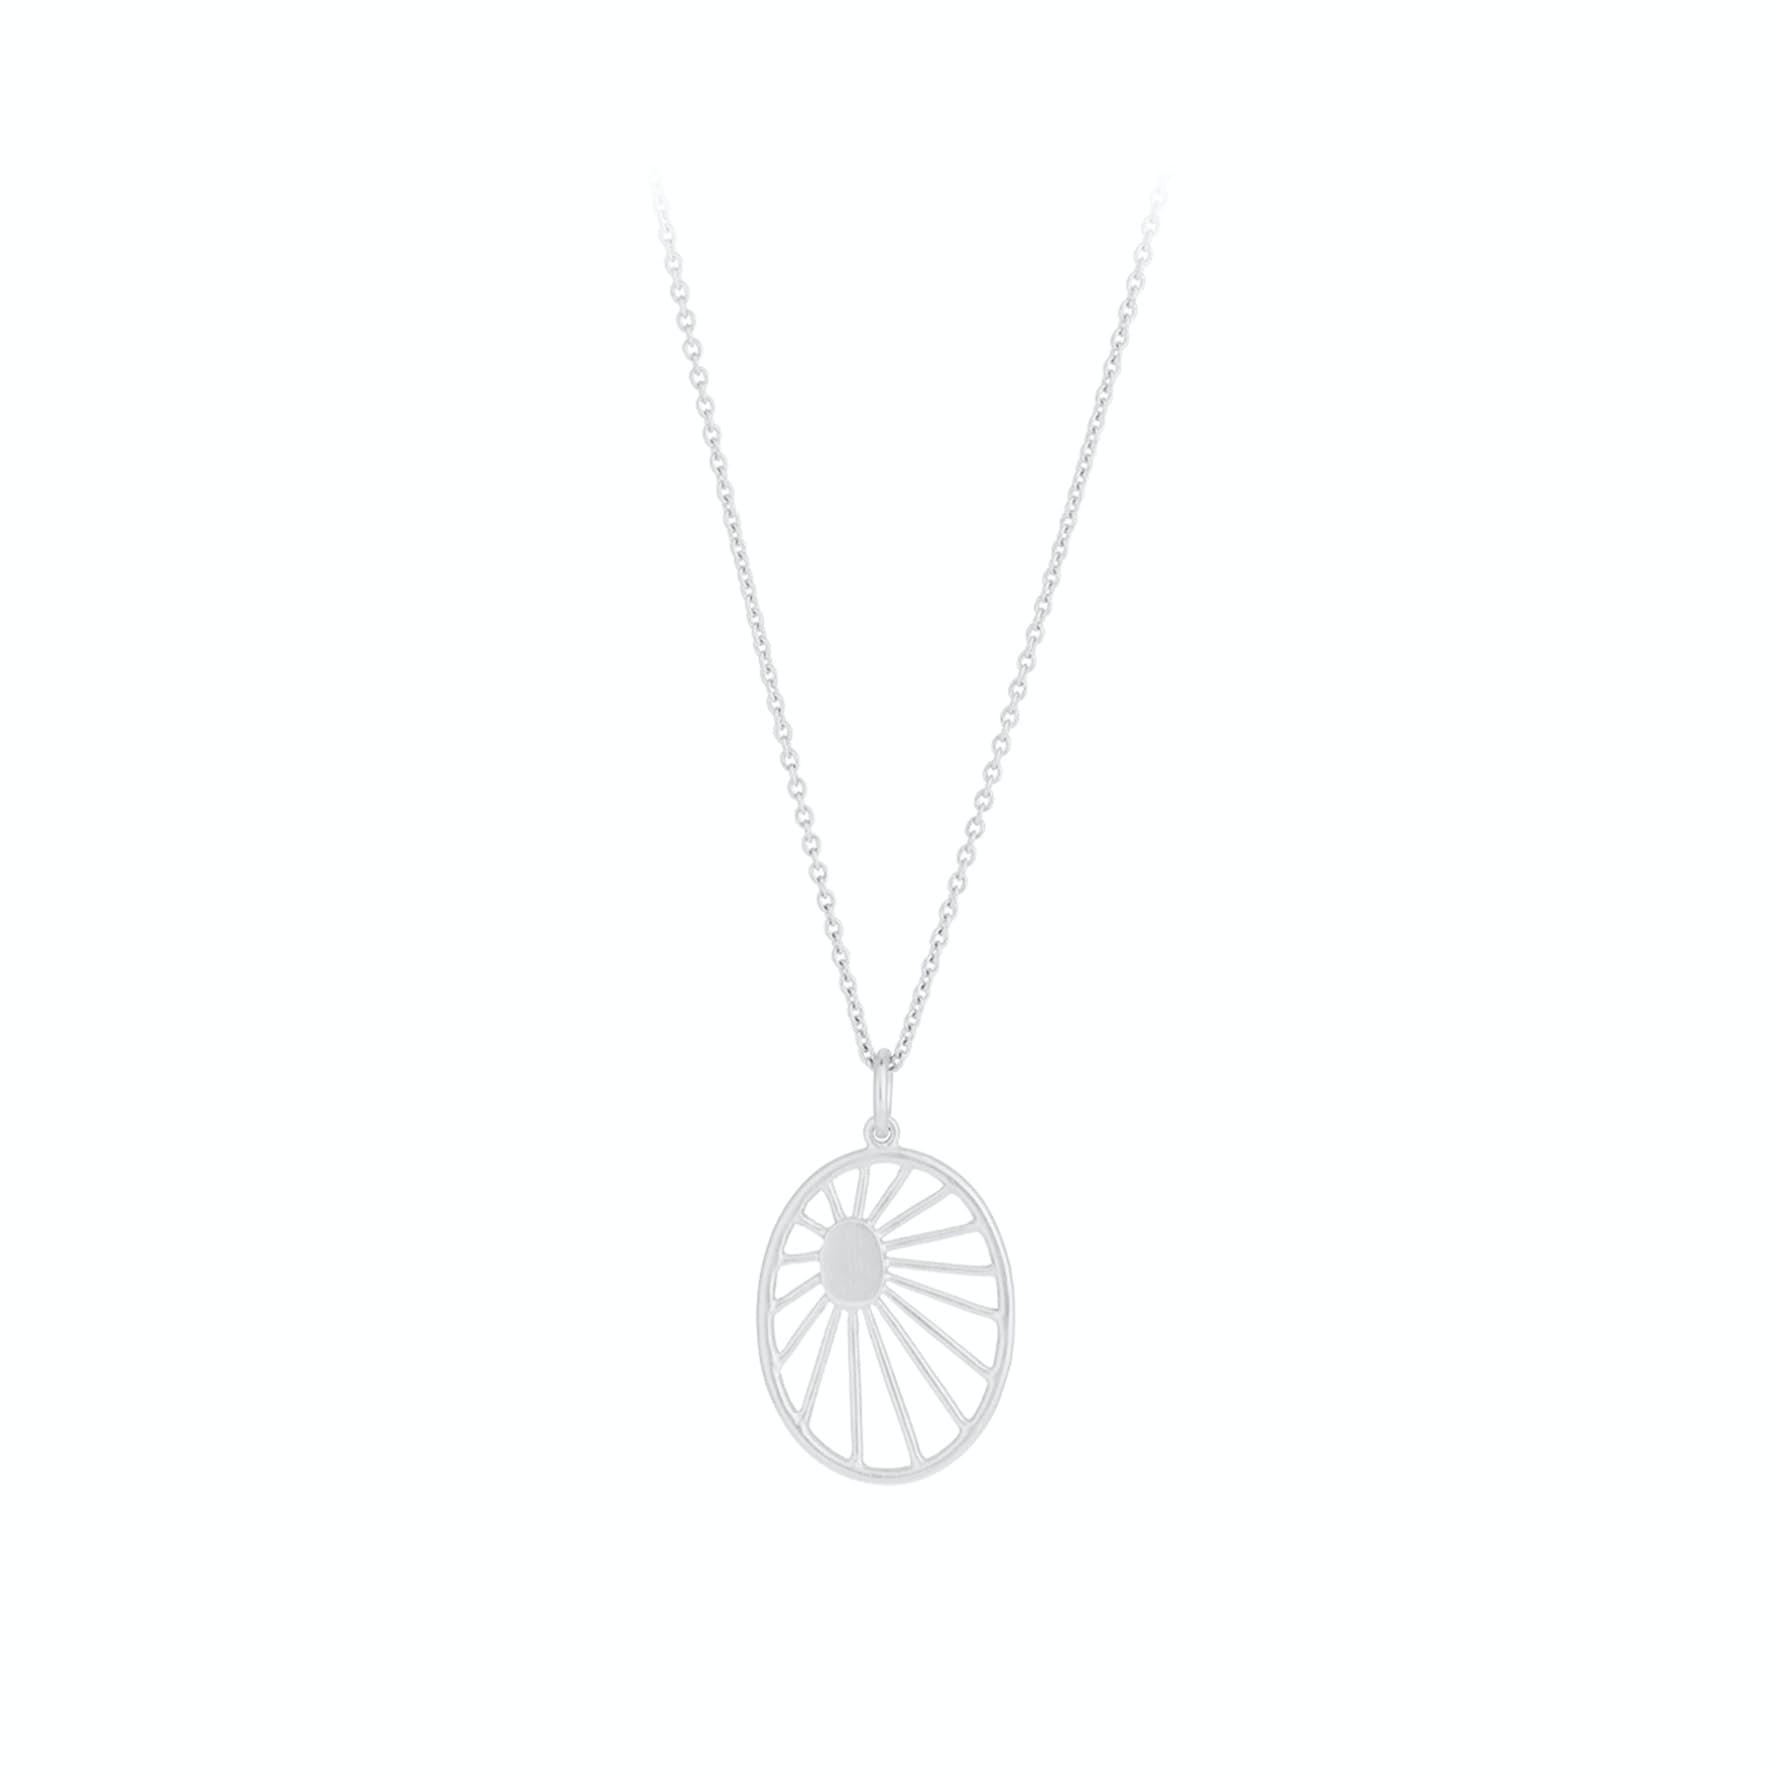 Daydream Necklace fra Pernille Corydon i Sølv Sterling 925